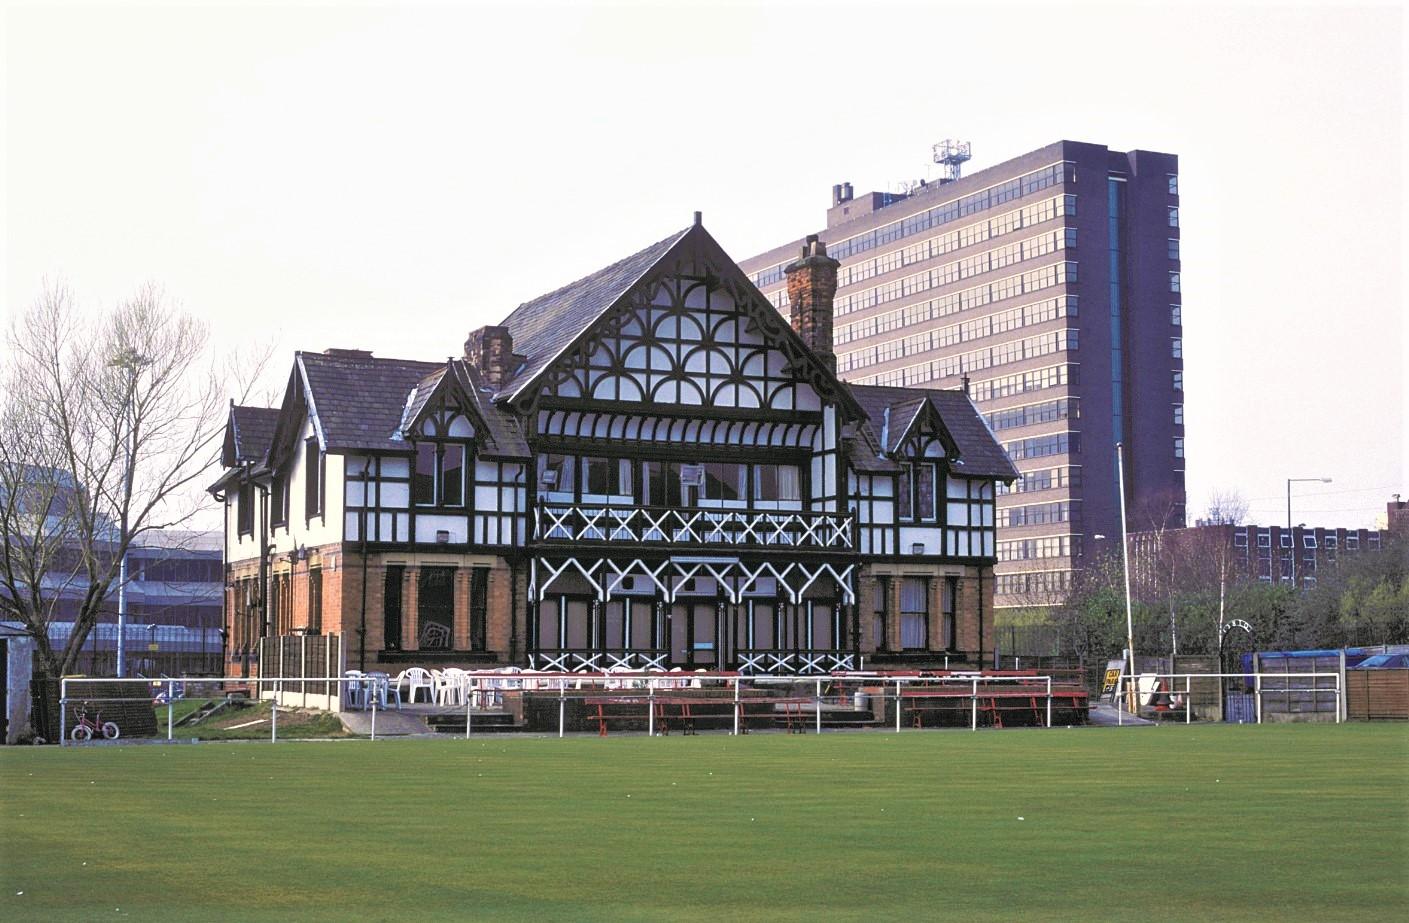 Exterior shot of Old Trafford Bowling Club